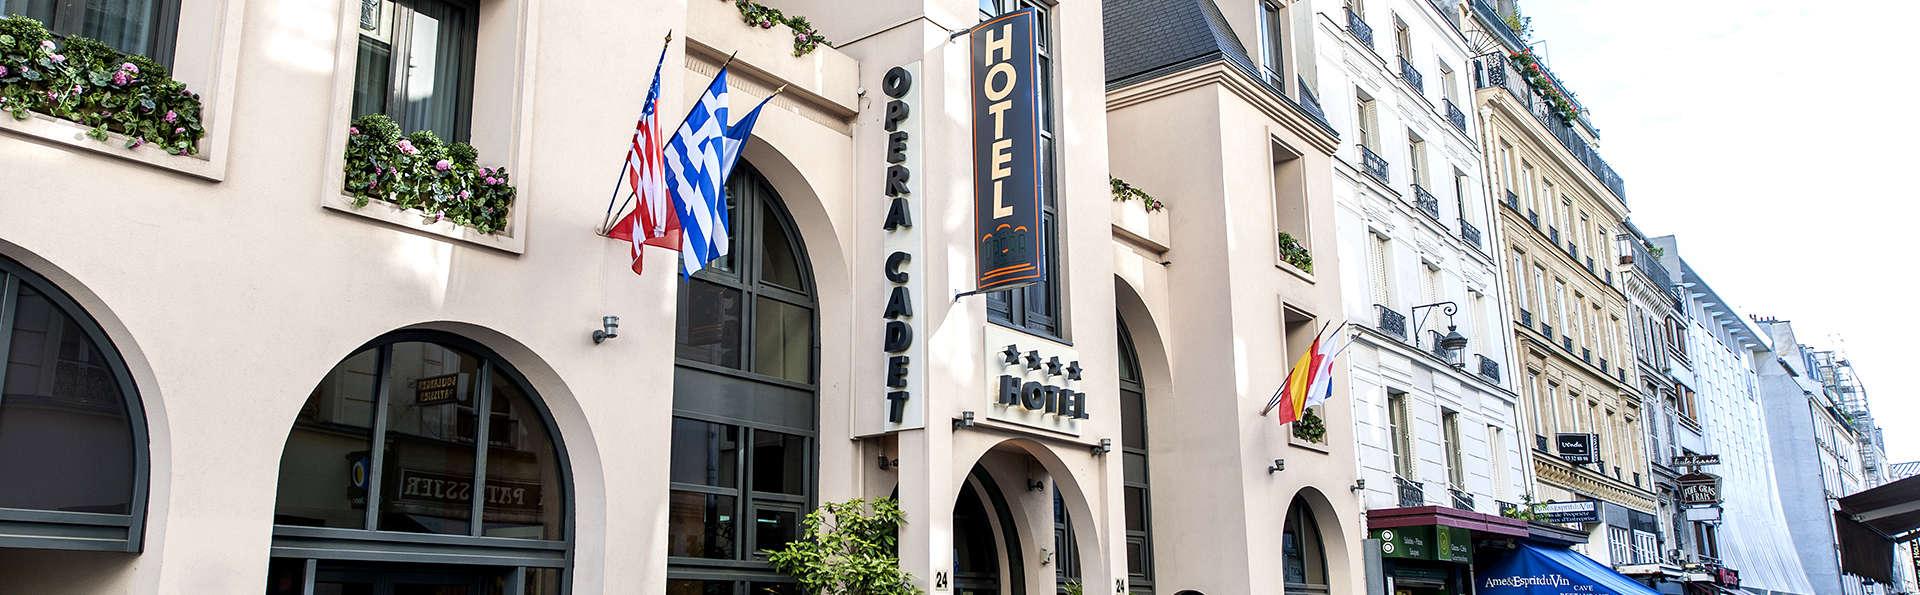 Hôtel Opéra Cadet - Edit_Front.jpg